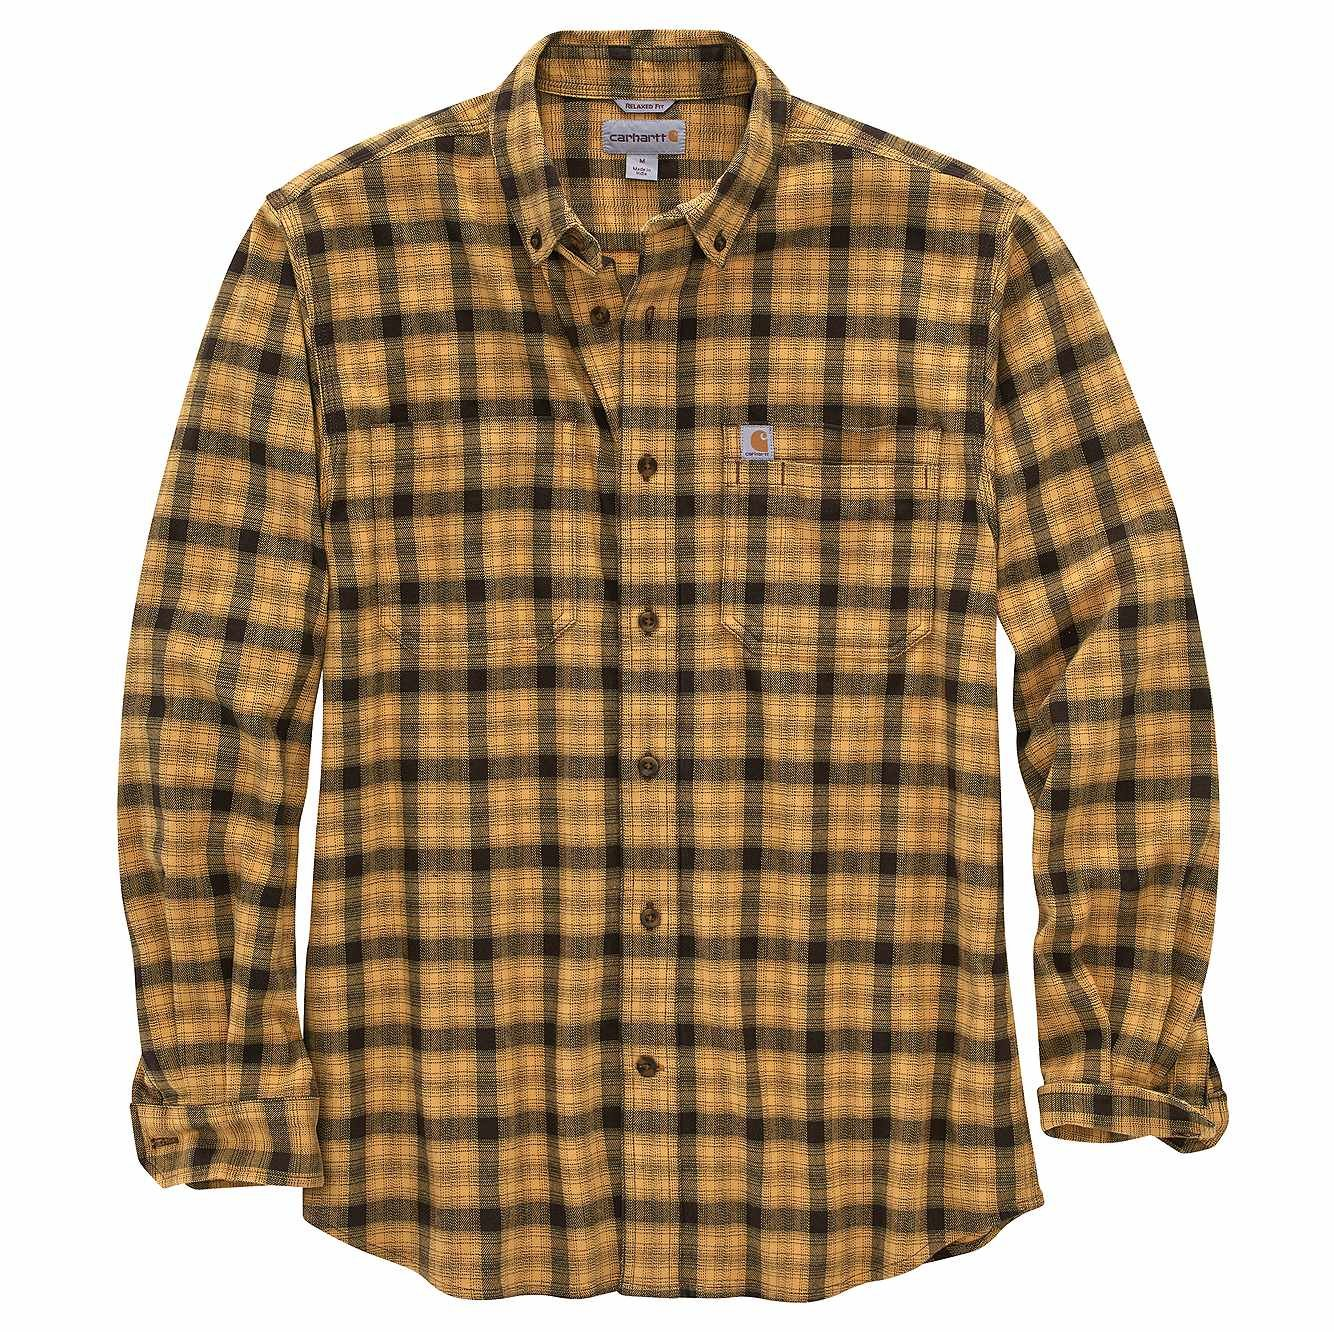 Carhartt 104448 Relaxed Fit Flannel Plaid - Khaki